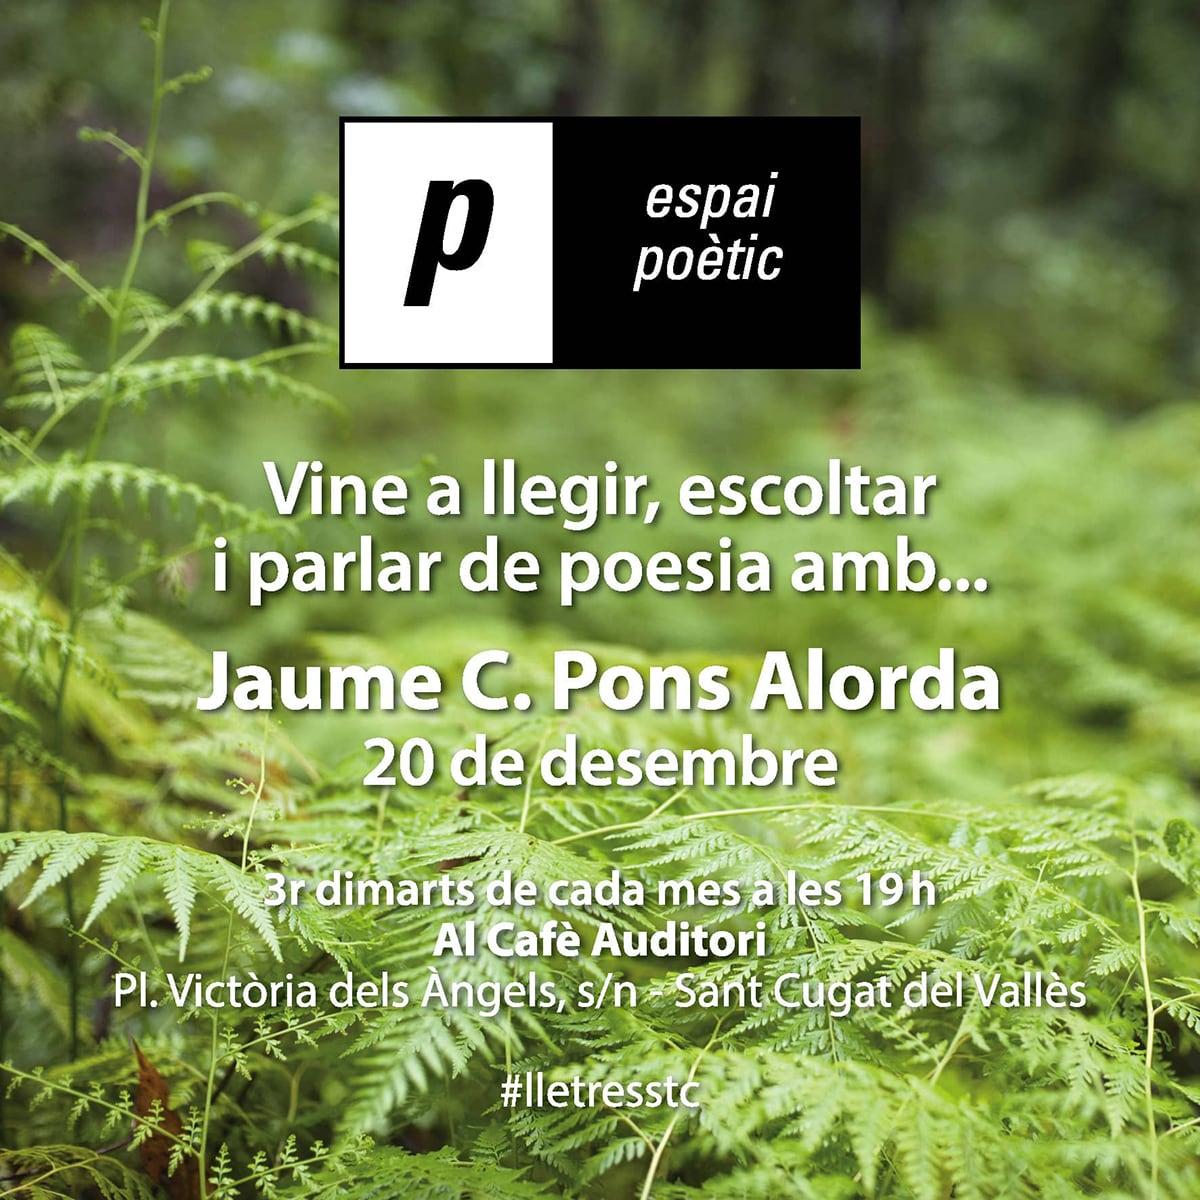 Espai poètic: Jaume C. Pons Alorda